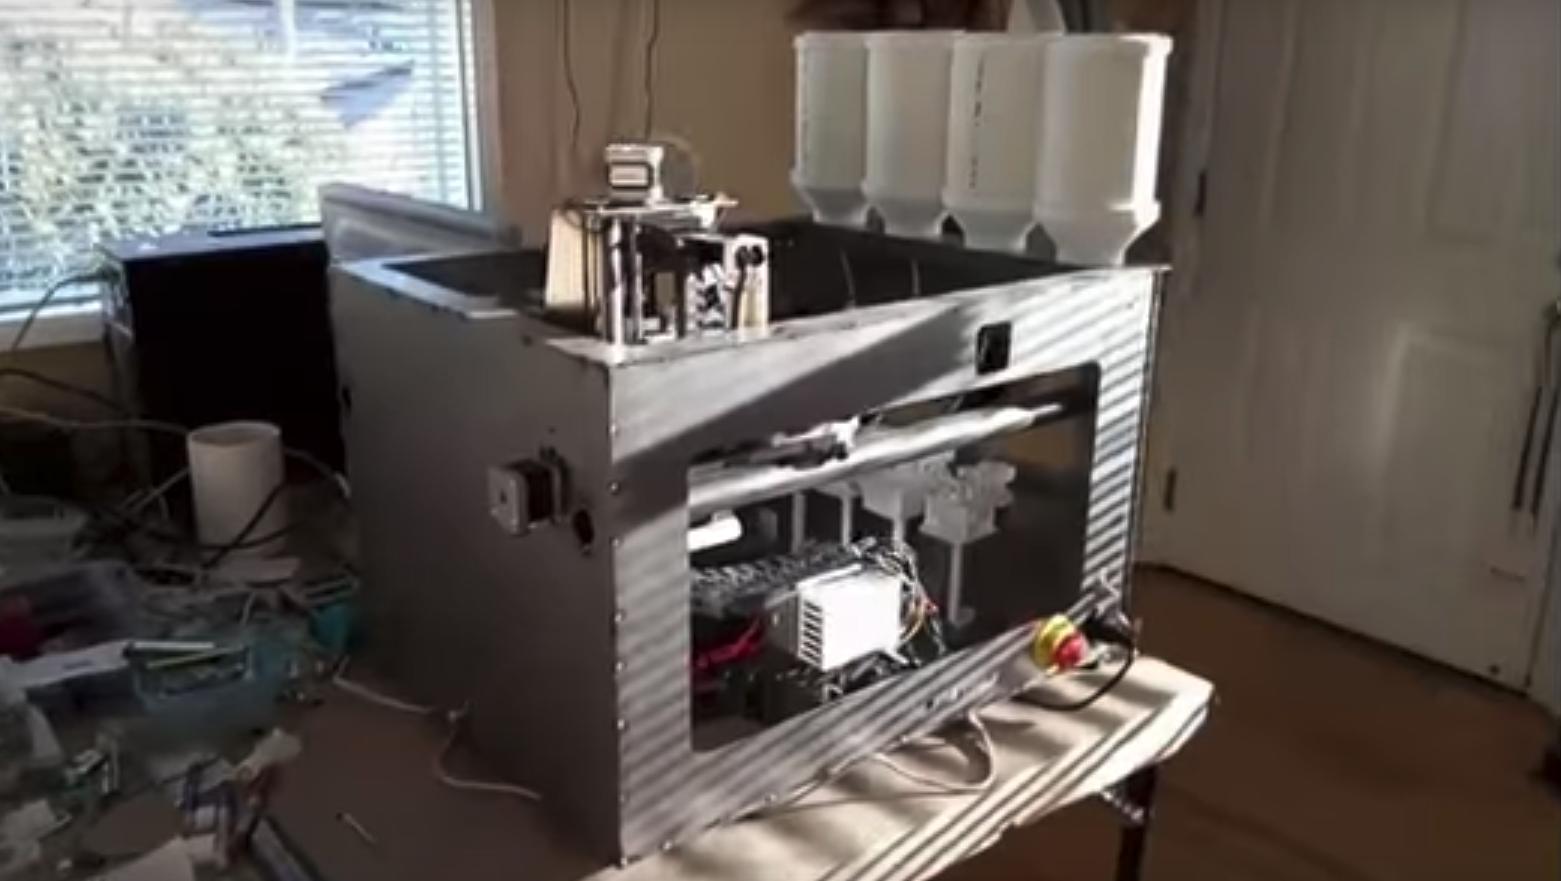 Iro3D is Developing a Desktop Metal 3D Printer That Only Costs $5,000 | All3DP